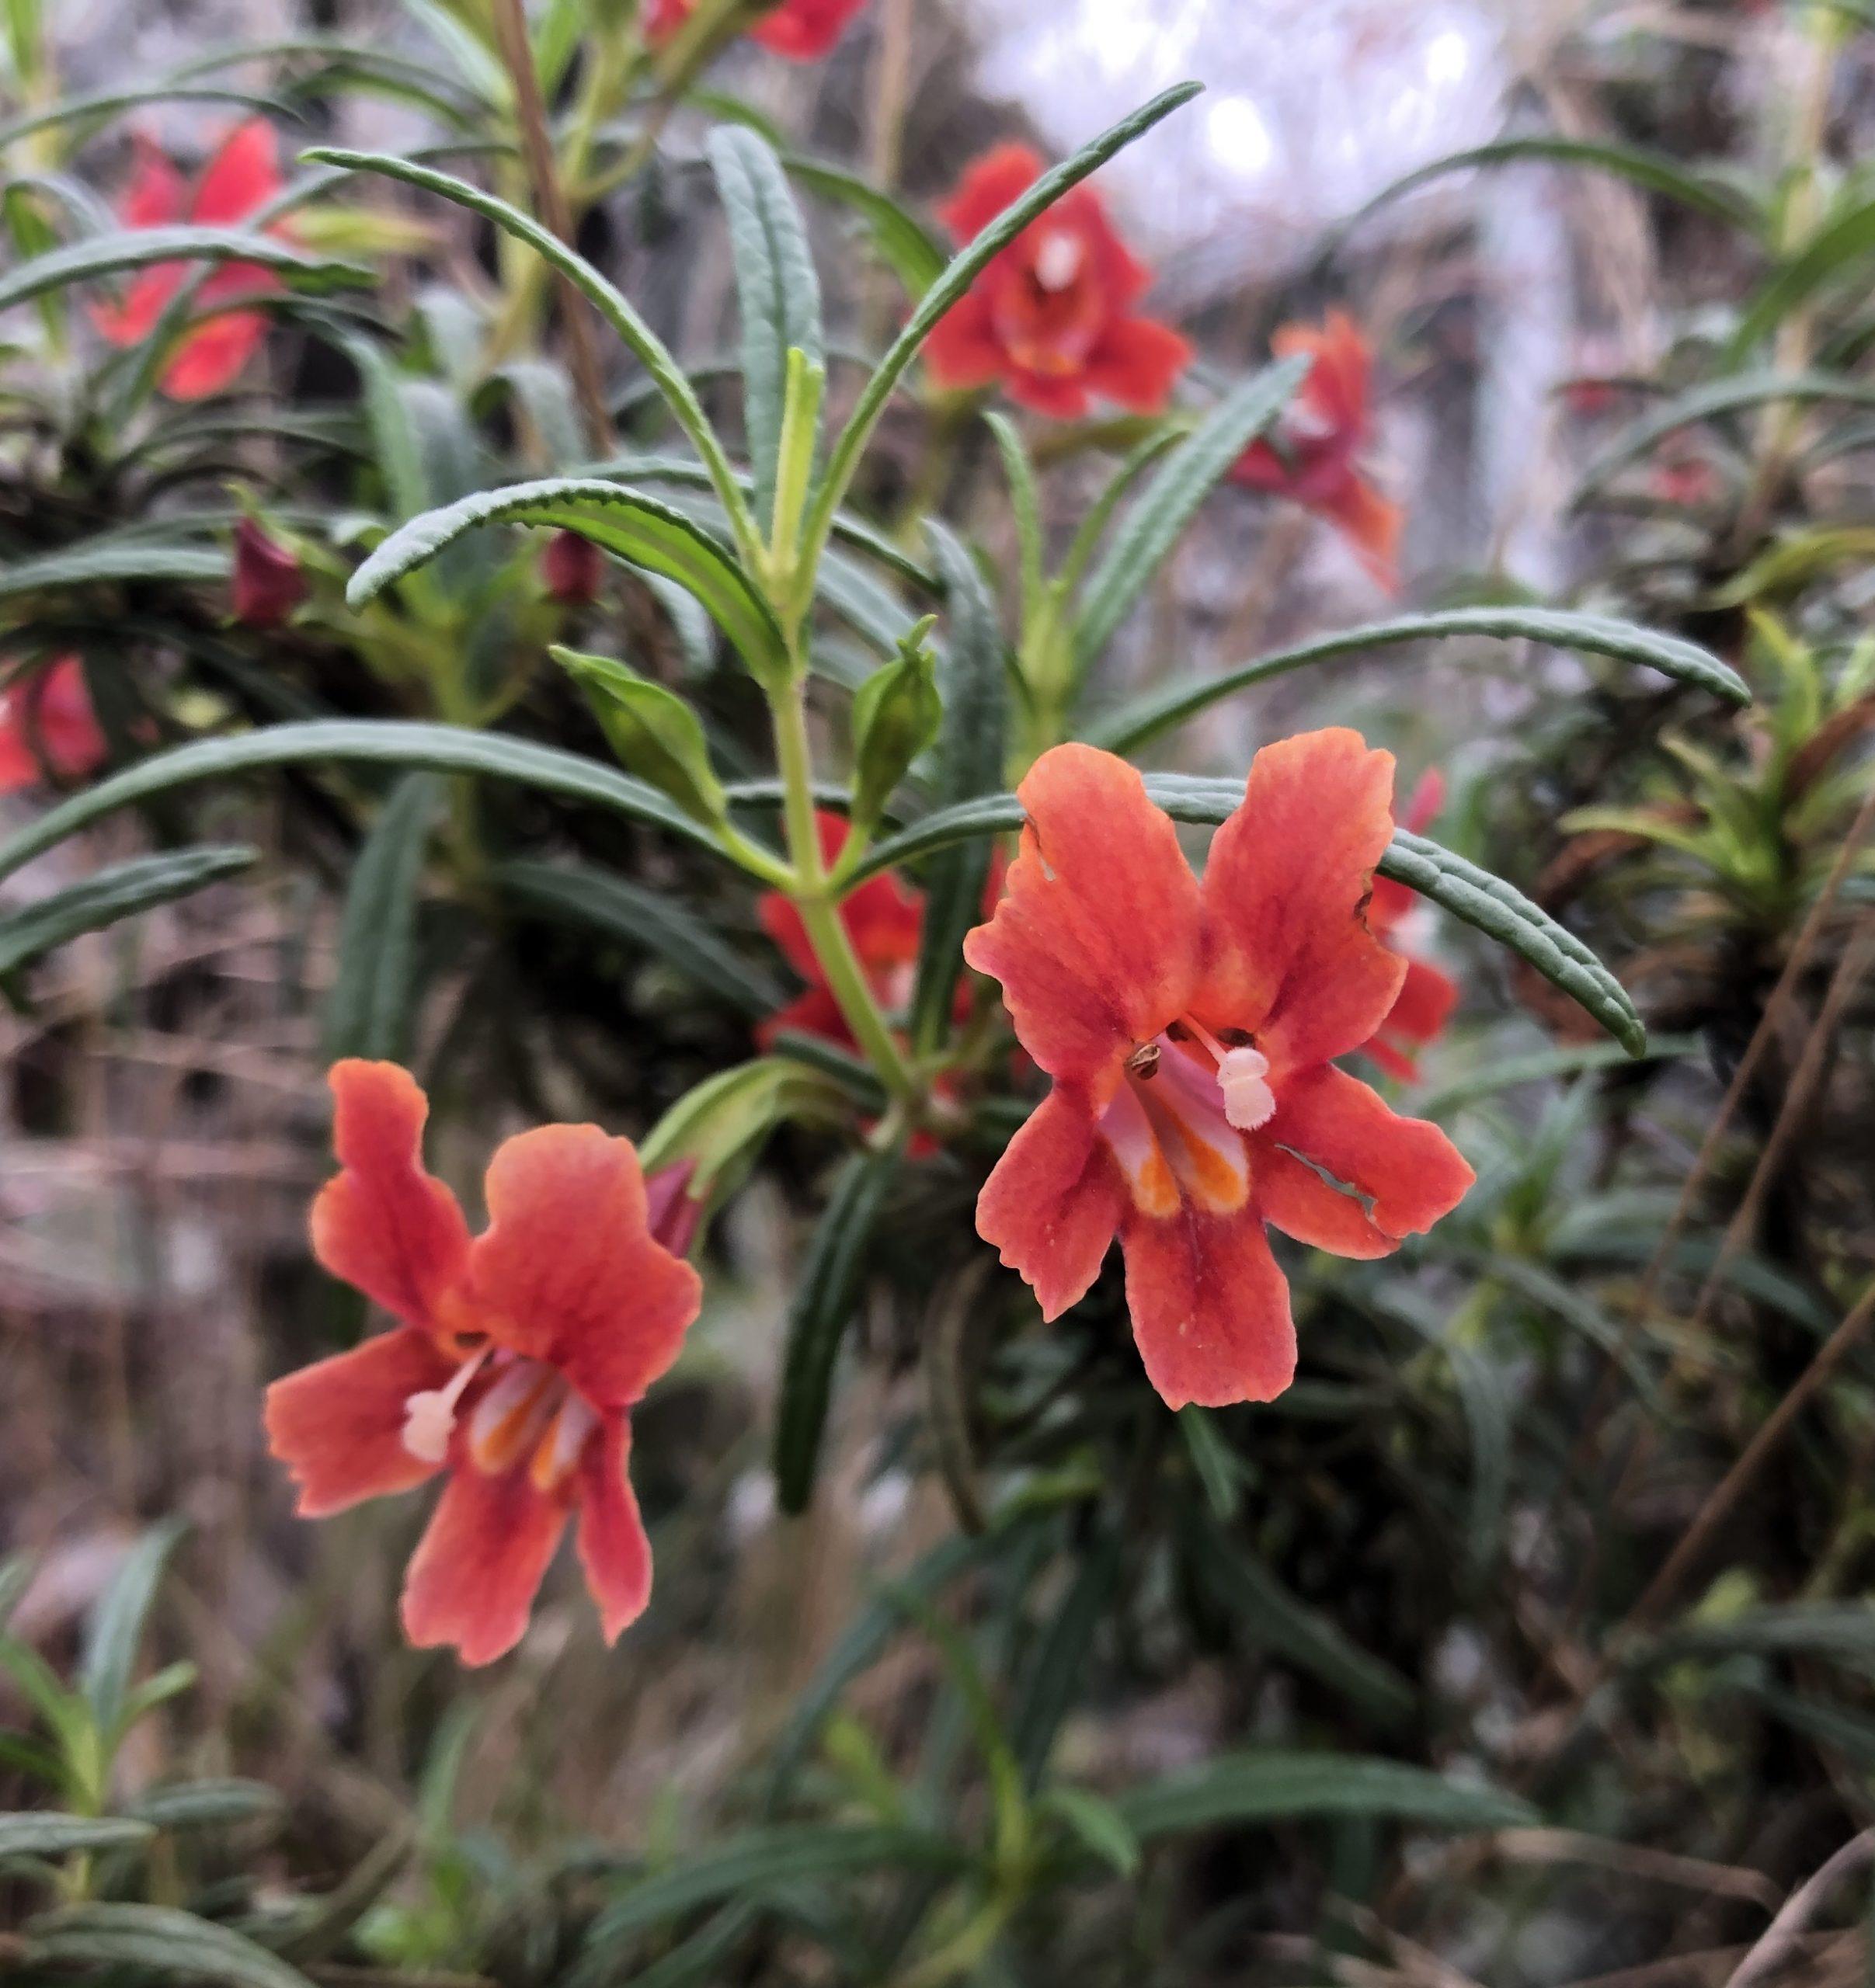 Mmonkeyflower (Diplacus aurantiacus)